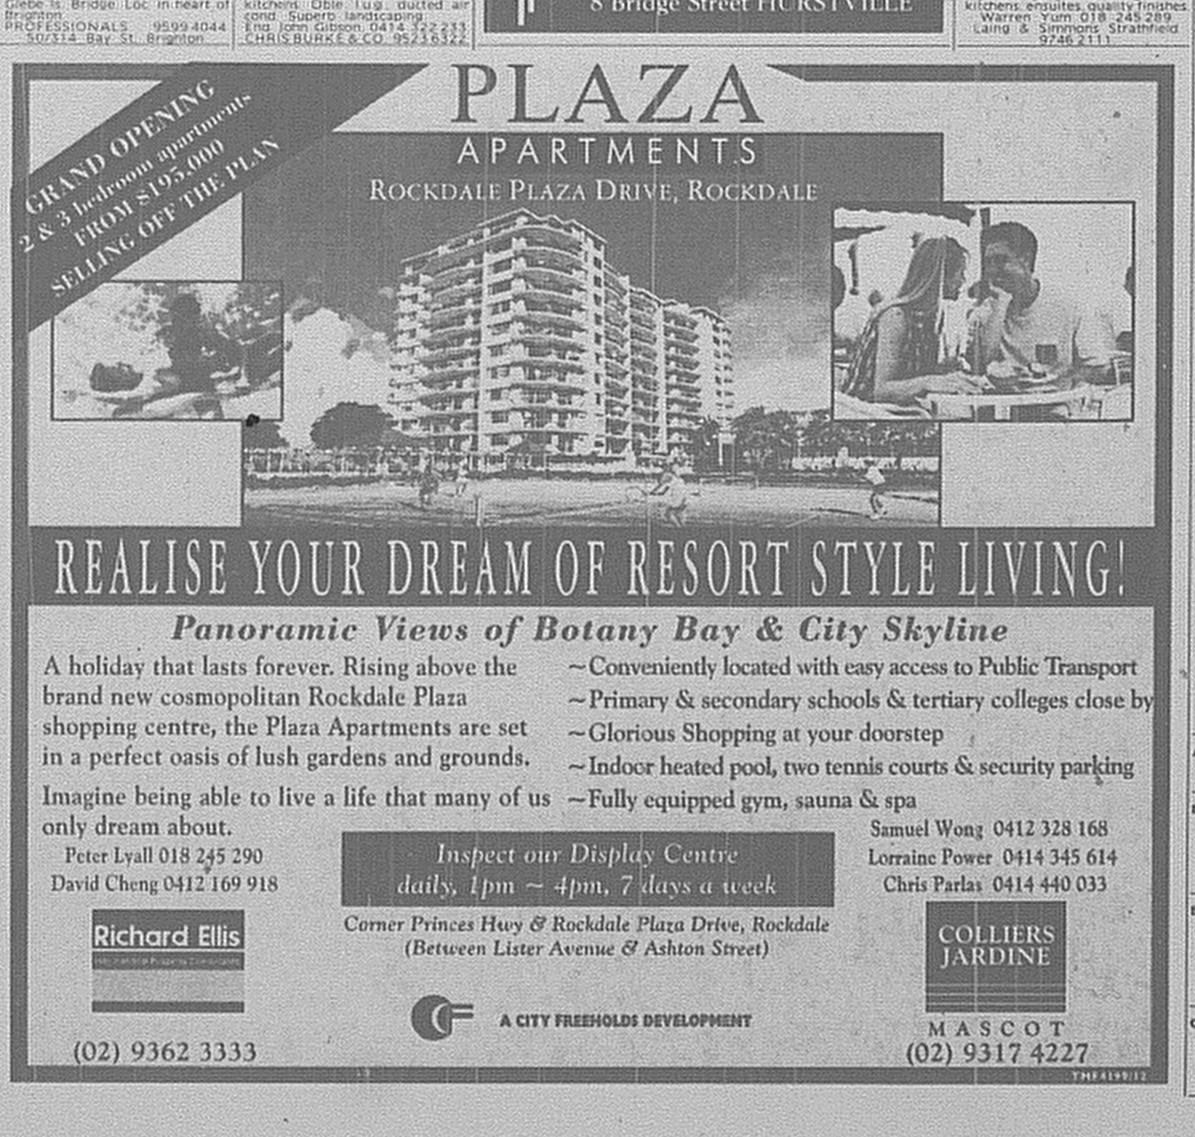 Plaza Apartments Rockdale Ad May 24 1997 SMH 27RE